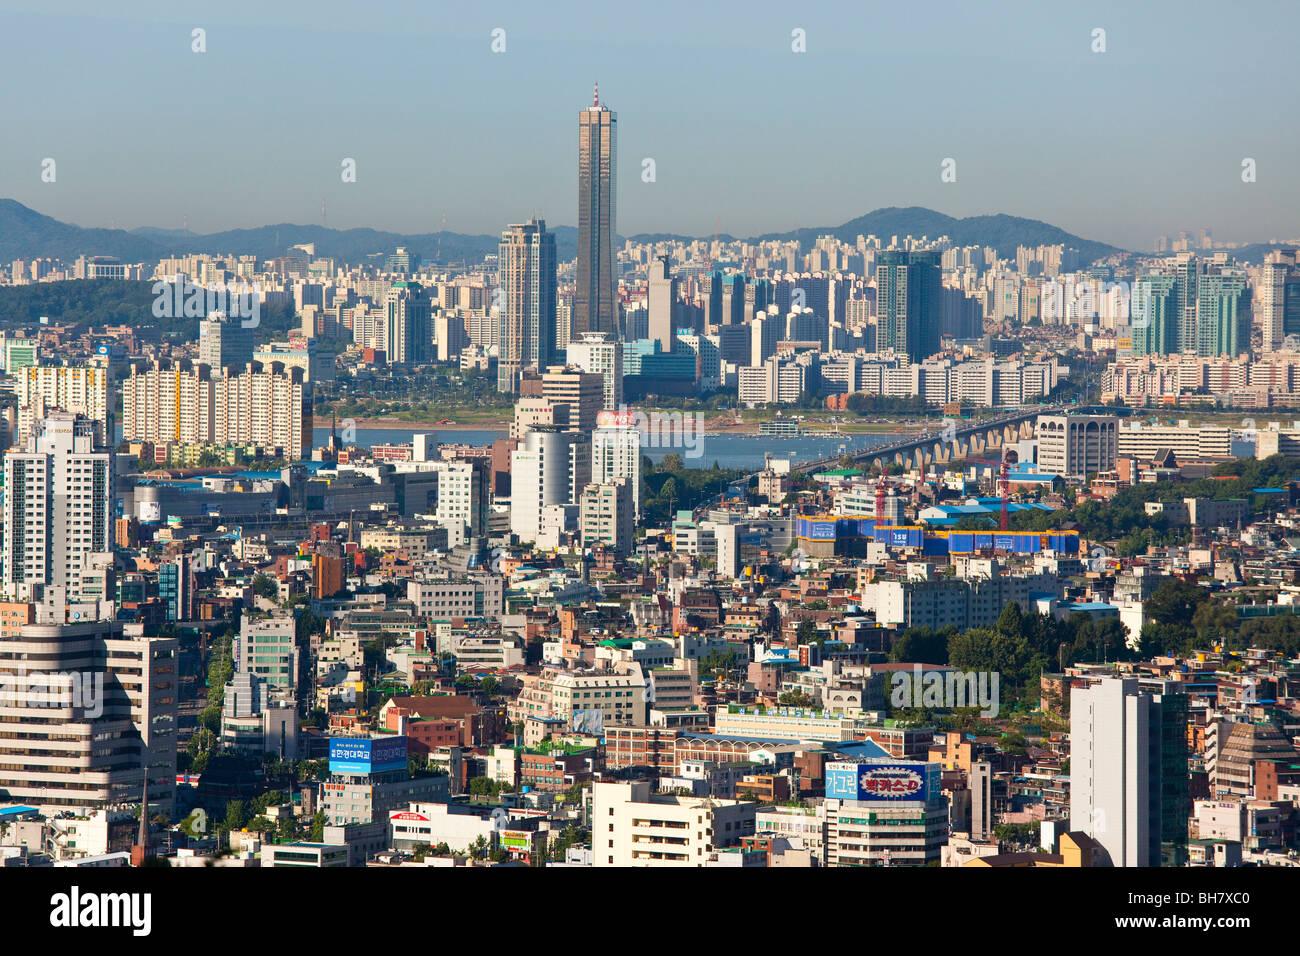 Skyline in Seoul South Korea - Stock Image